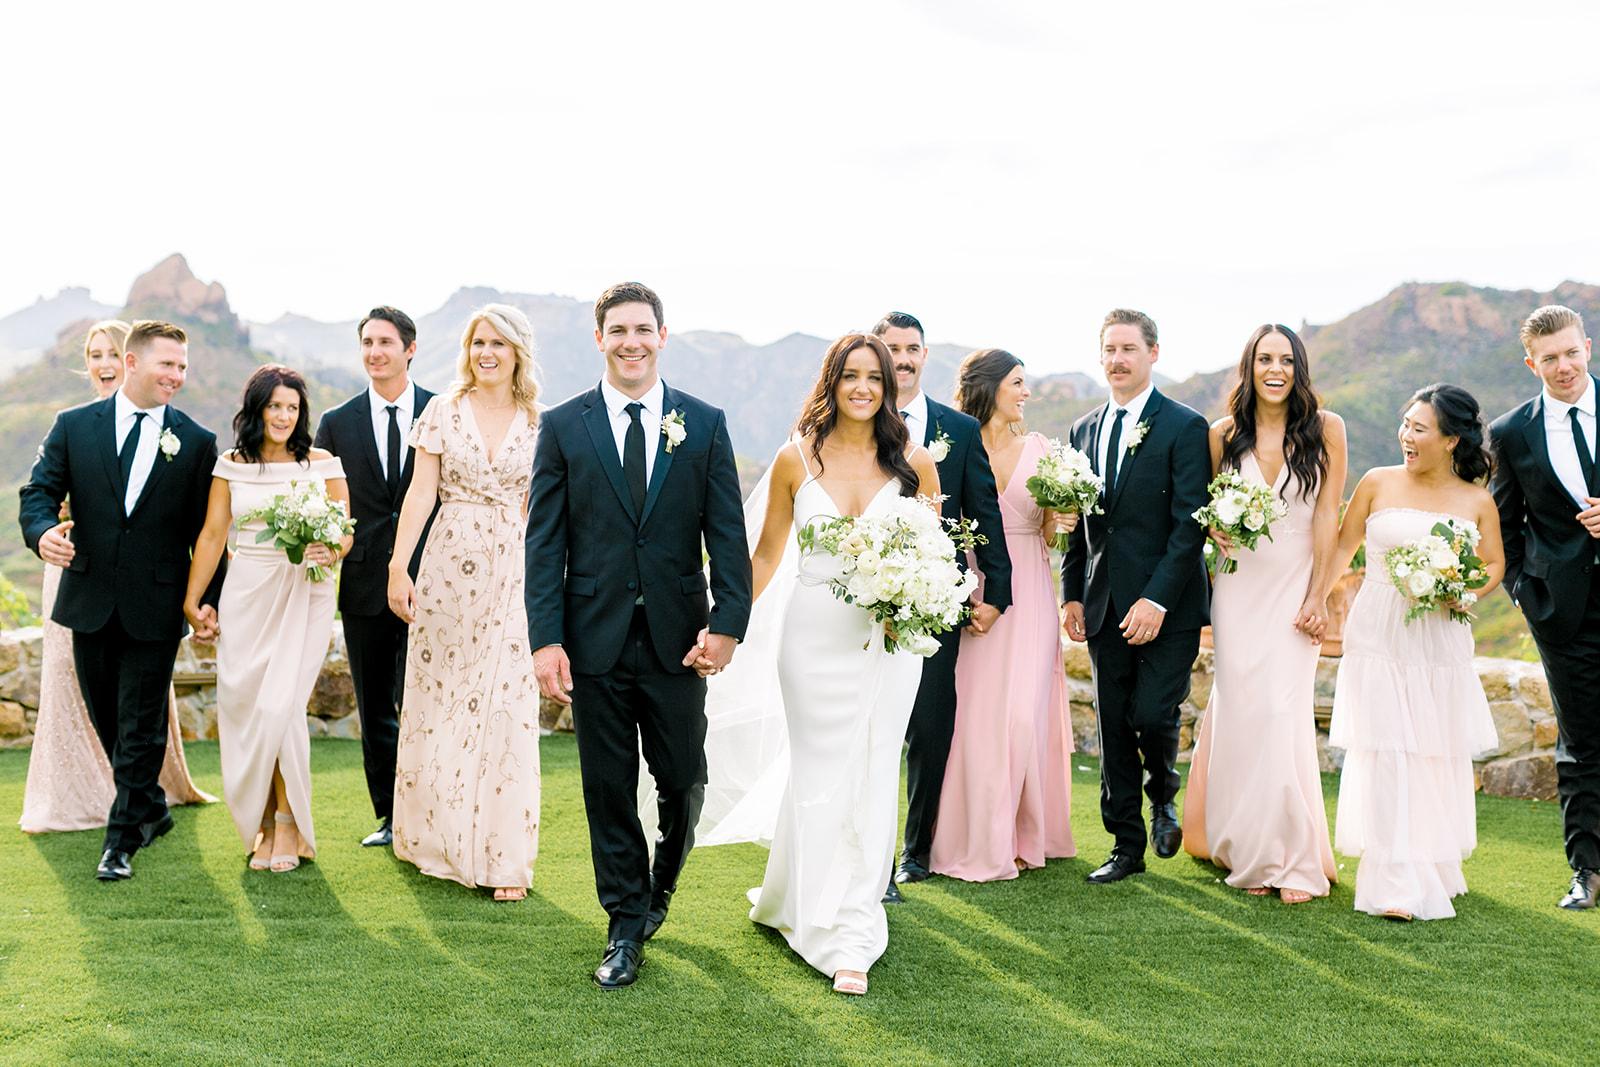 Ben & Emma's Wedding - Natalie Schutt Photography - Bridal Party.jpg